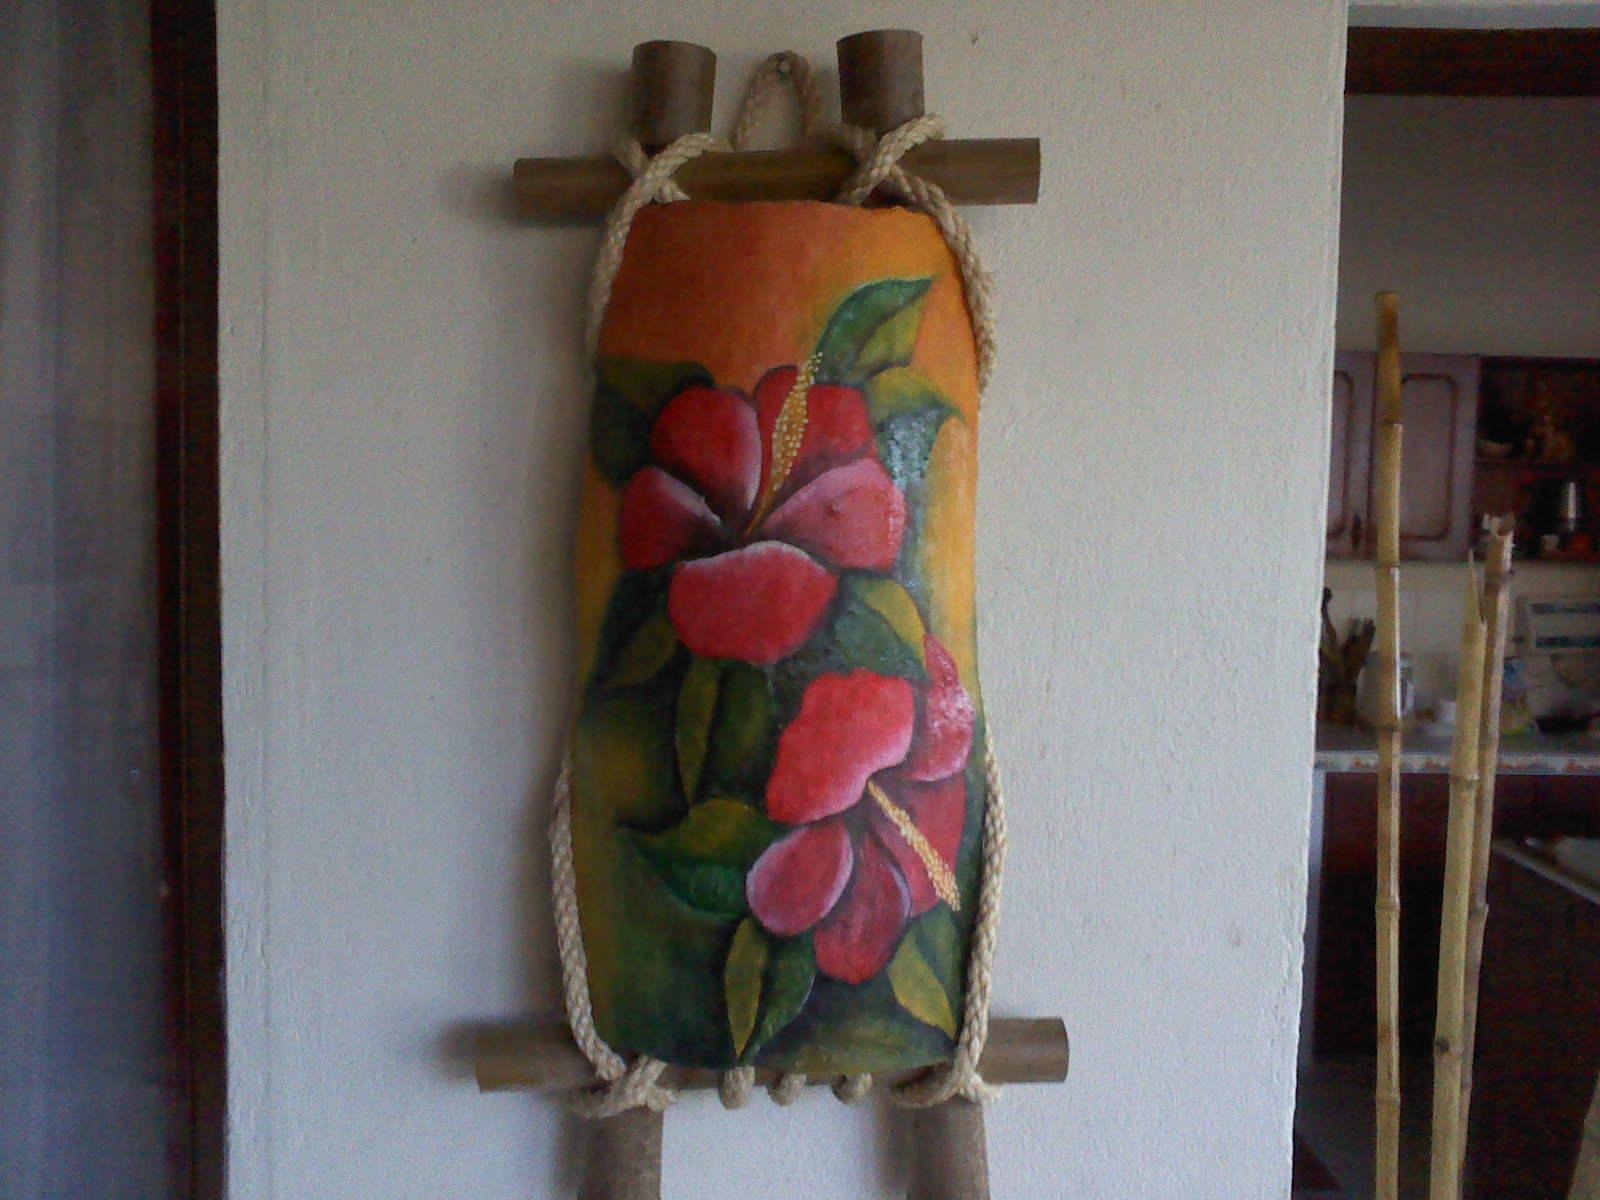 Pintura sobre tejas manualidades camerom for Pintura para tejas